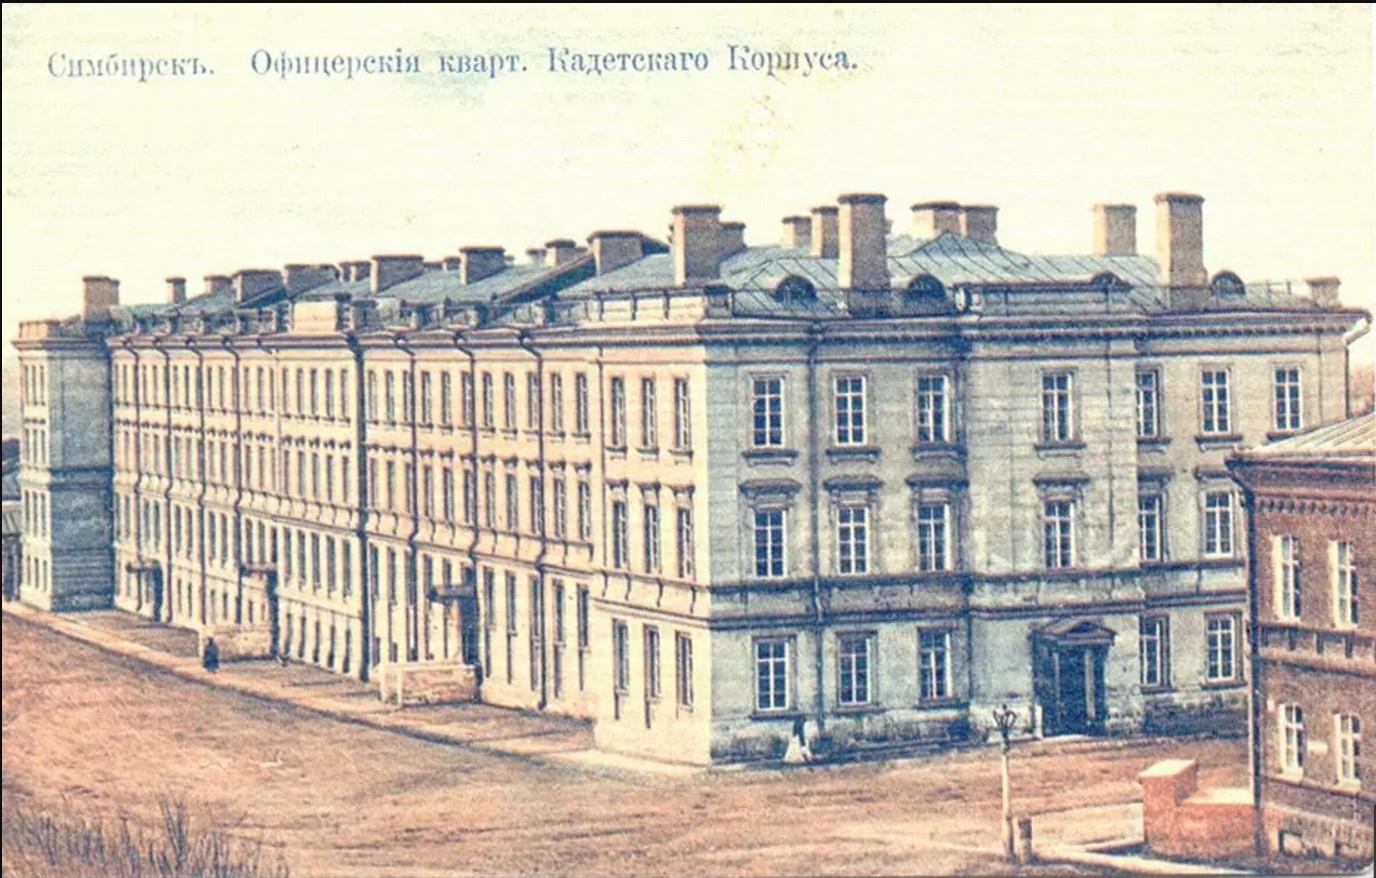 Офицерские квартиры Кадетского корпуса